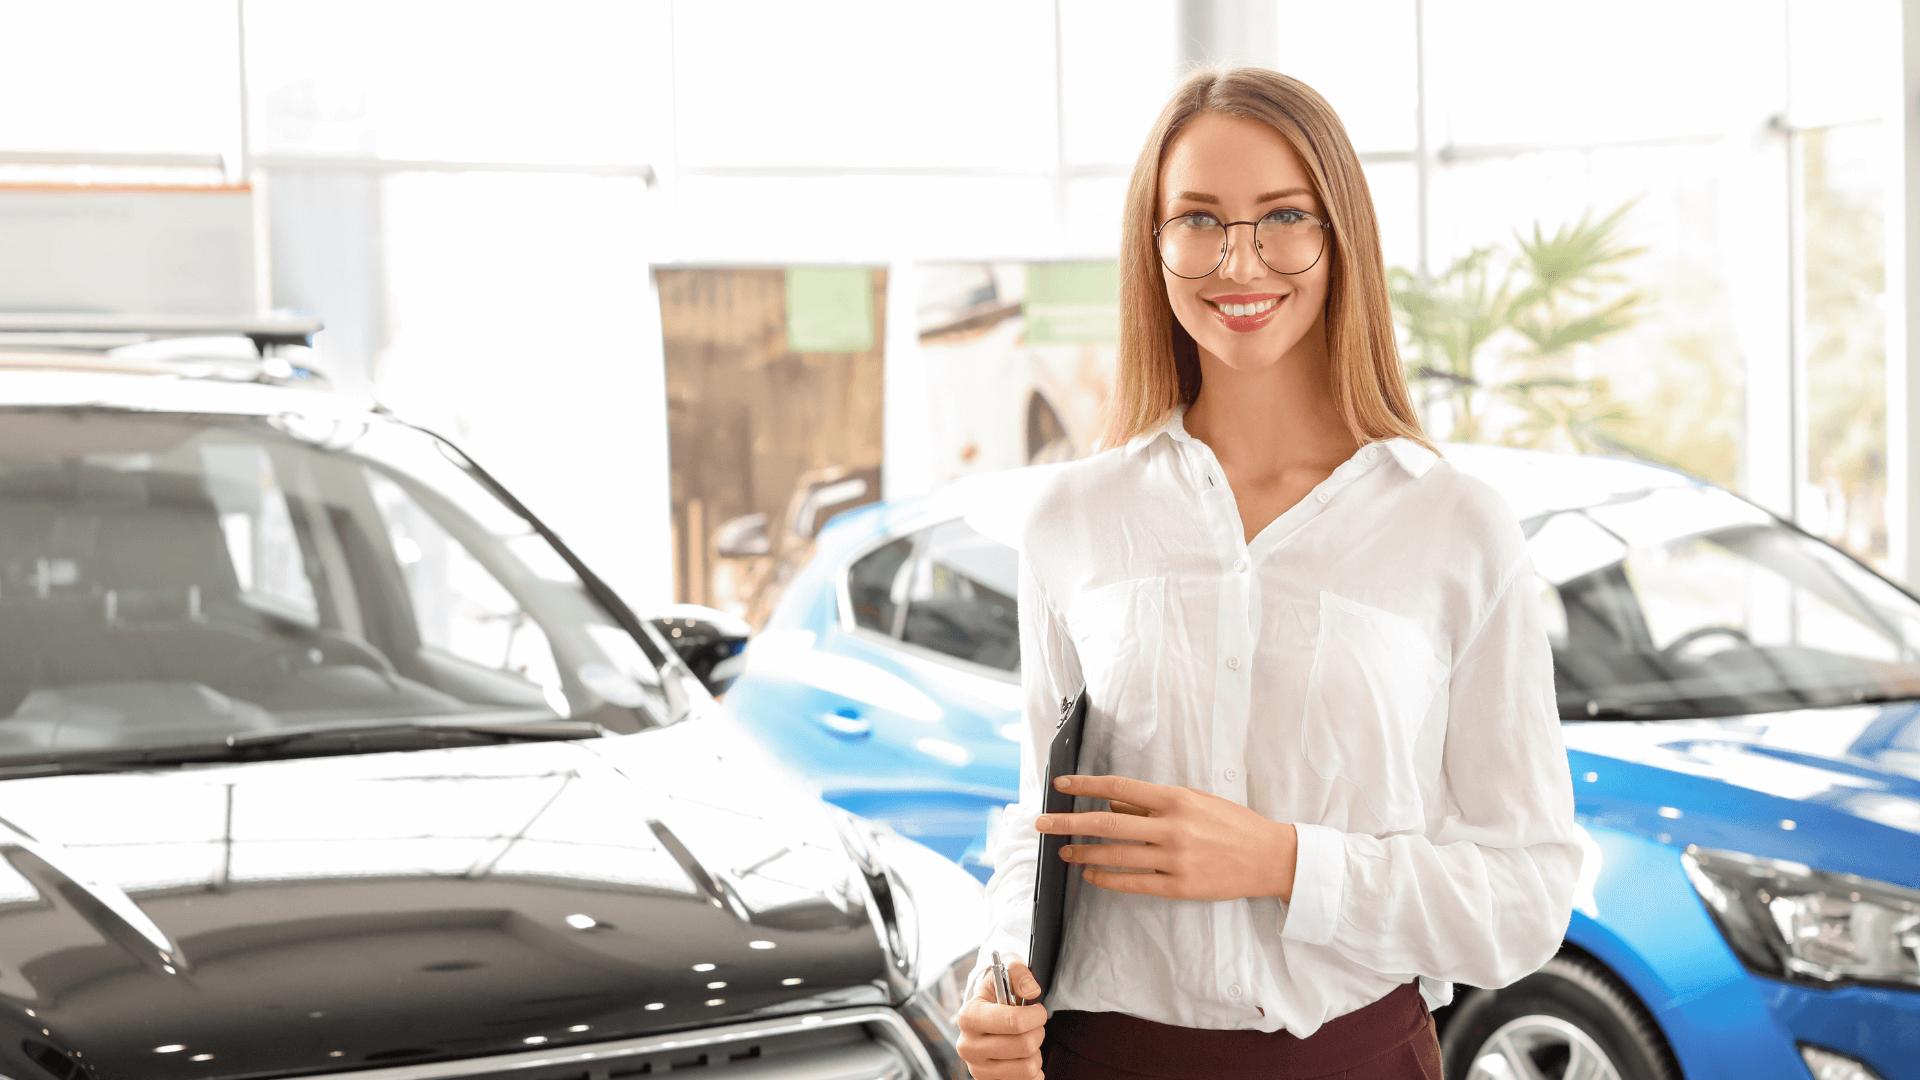 abschlussprüfung automobilkaufmann 2021